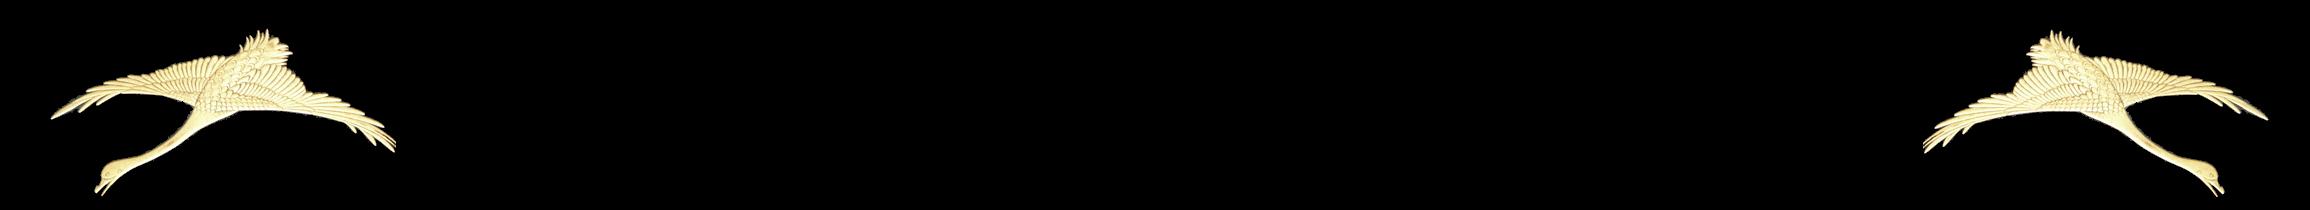 bracketbasefinalized2.png